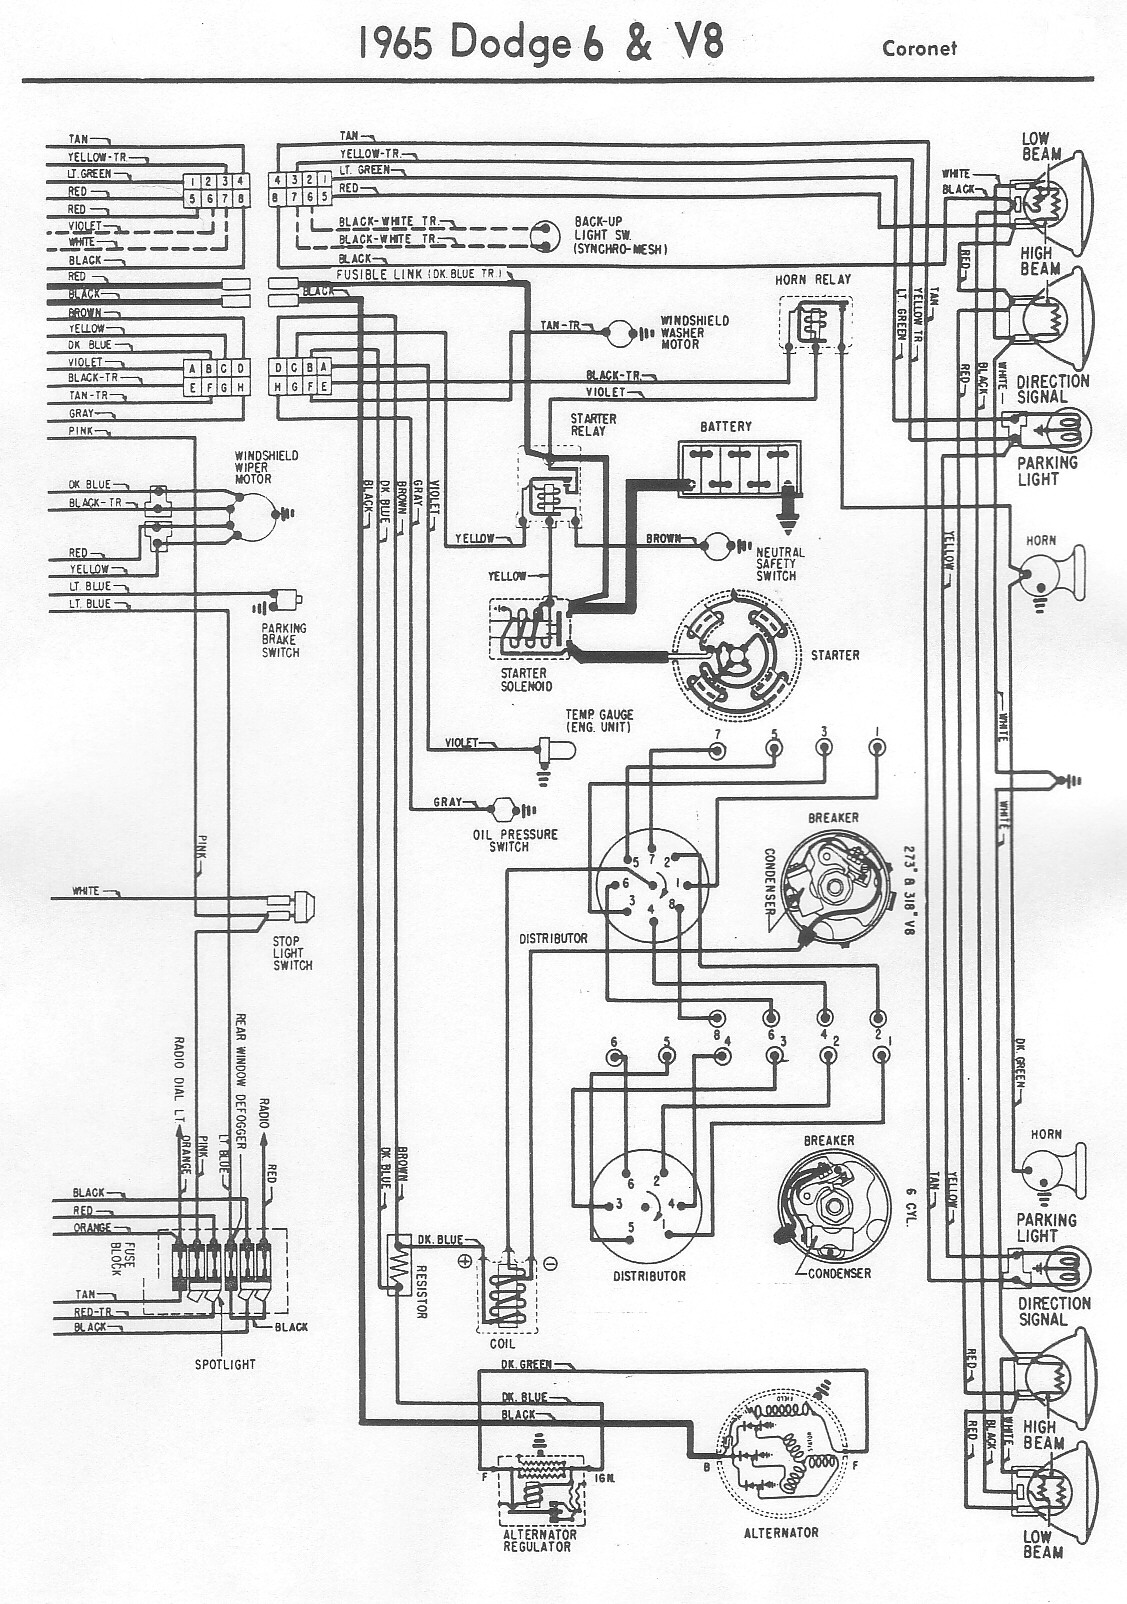 hight resolution of 1966 dodge wiring diagram wiring diagram blogs 2012 dodge charger pcm wiring diagram 1966 dodge wiring